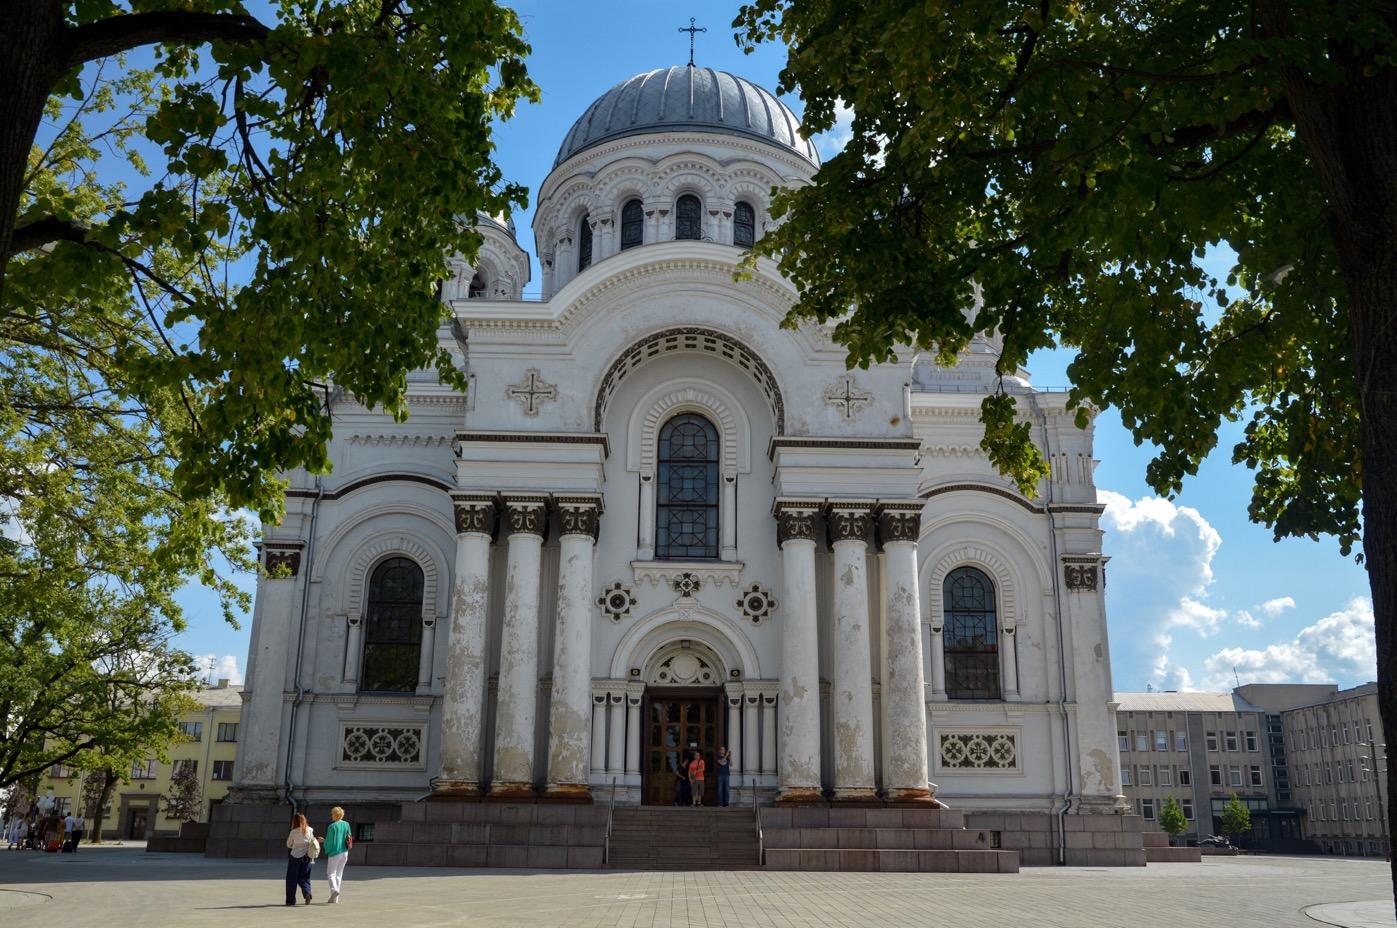 St. Michael's the Archangel Church, Kaunas, Lithuania